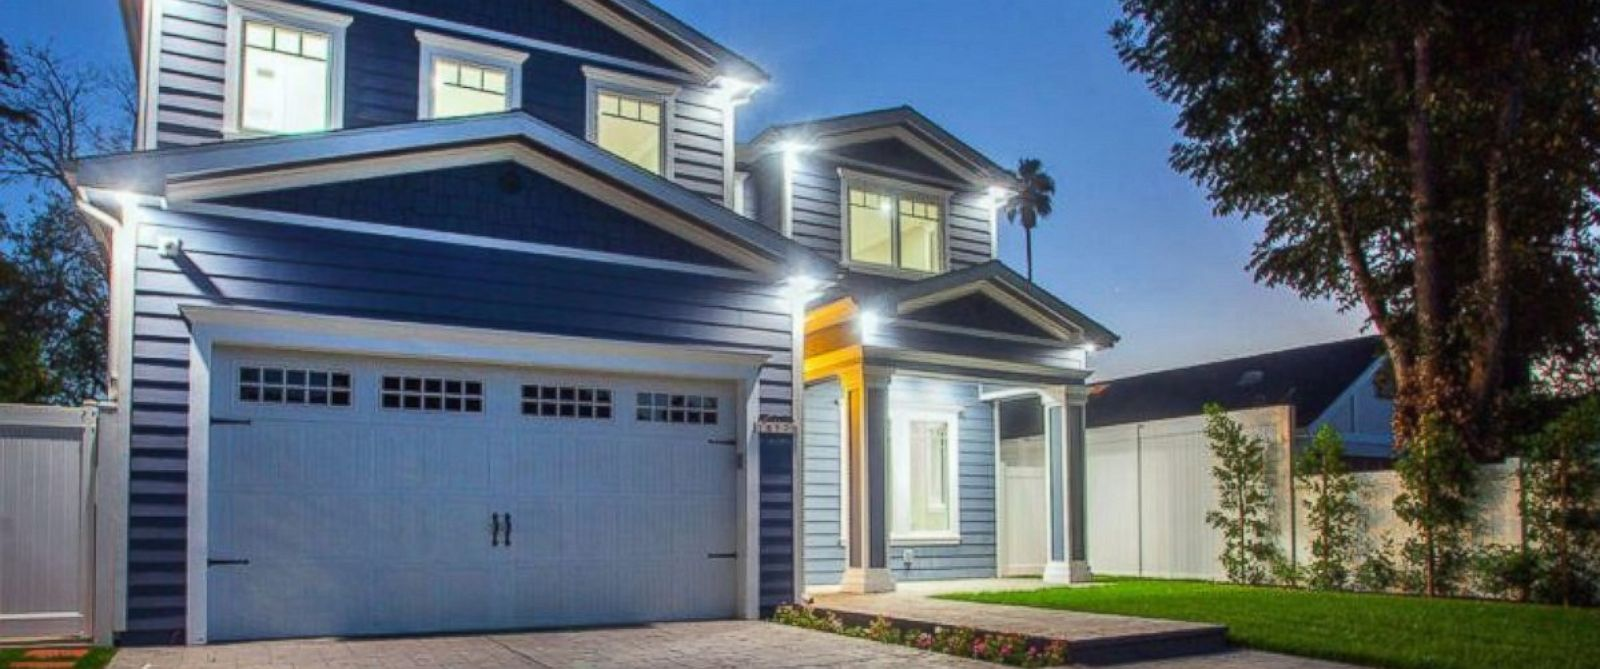 PHOTO: Ne-Yos $1.9 million Sherman Oaks, California home.